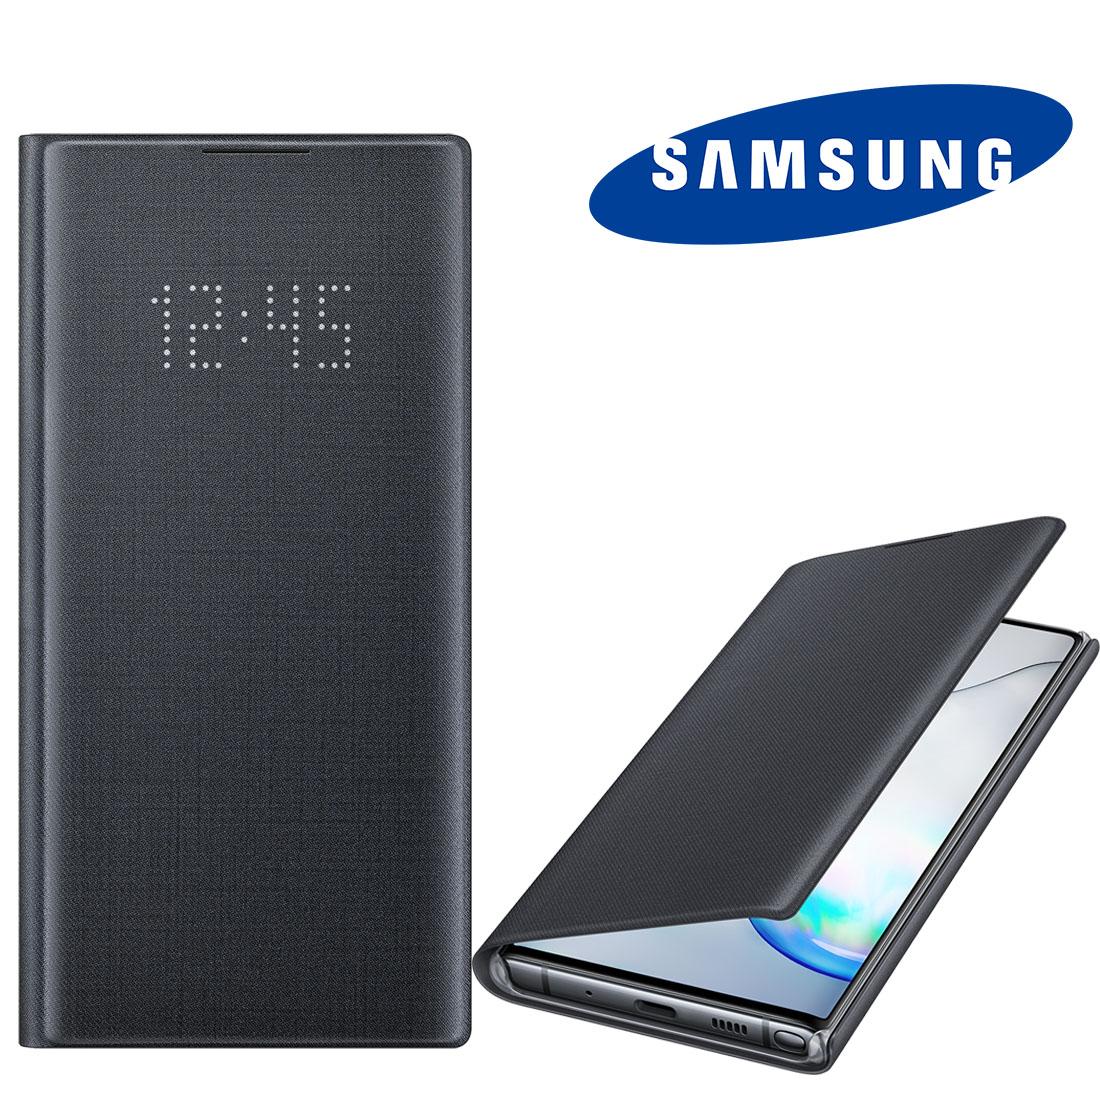 Capa Original Samsung Led View Cover Note 10 6.3 pol SM-N970  - HARS